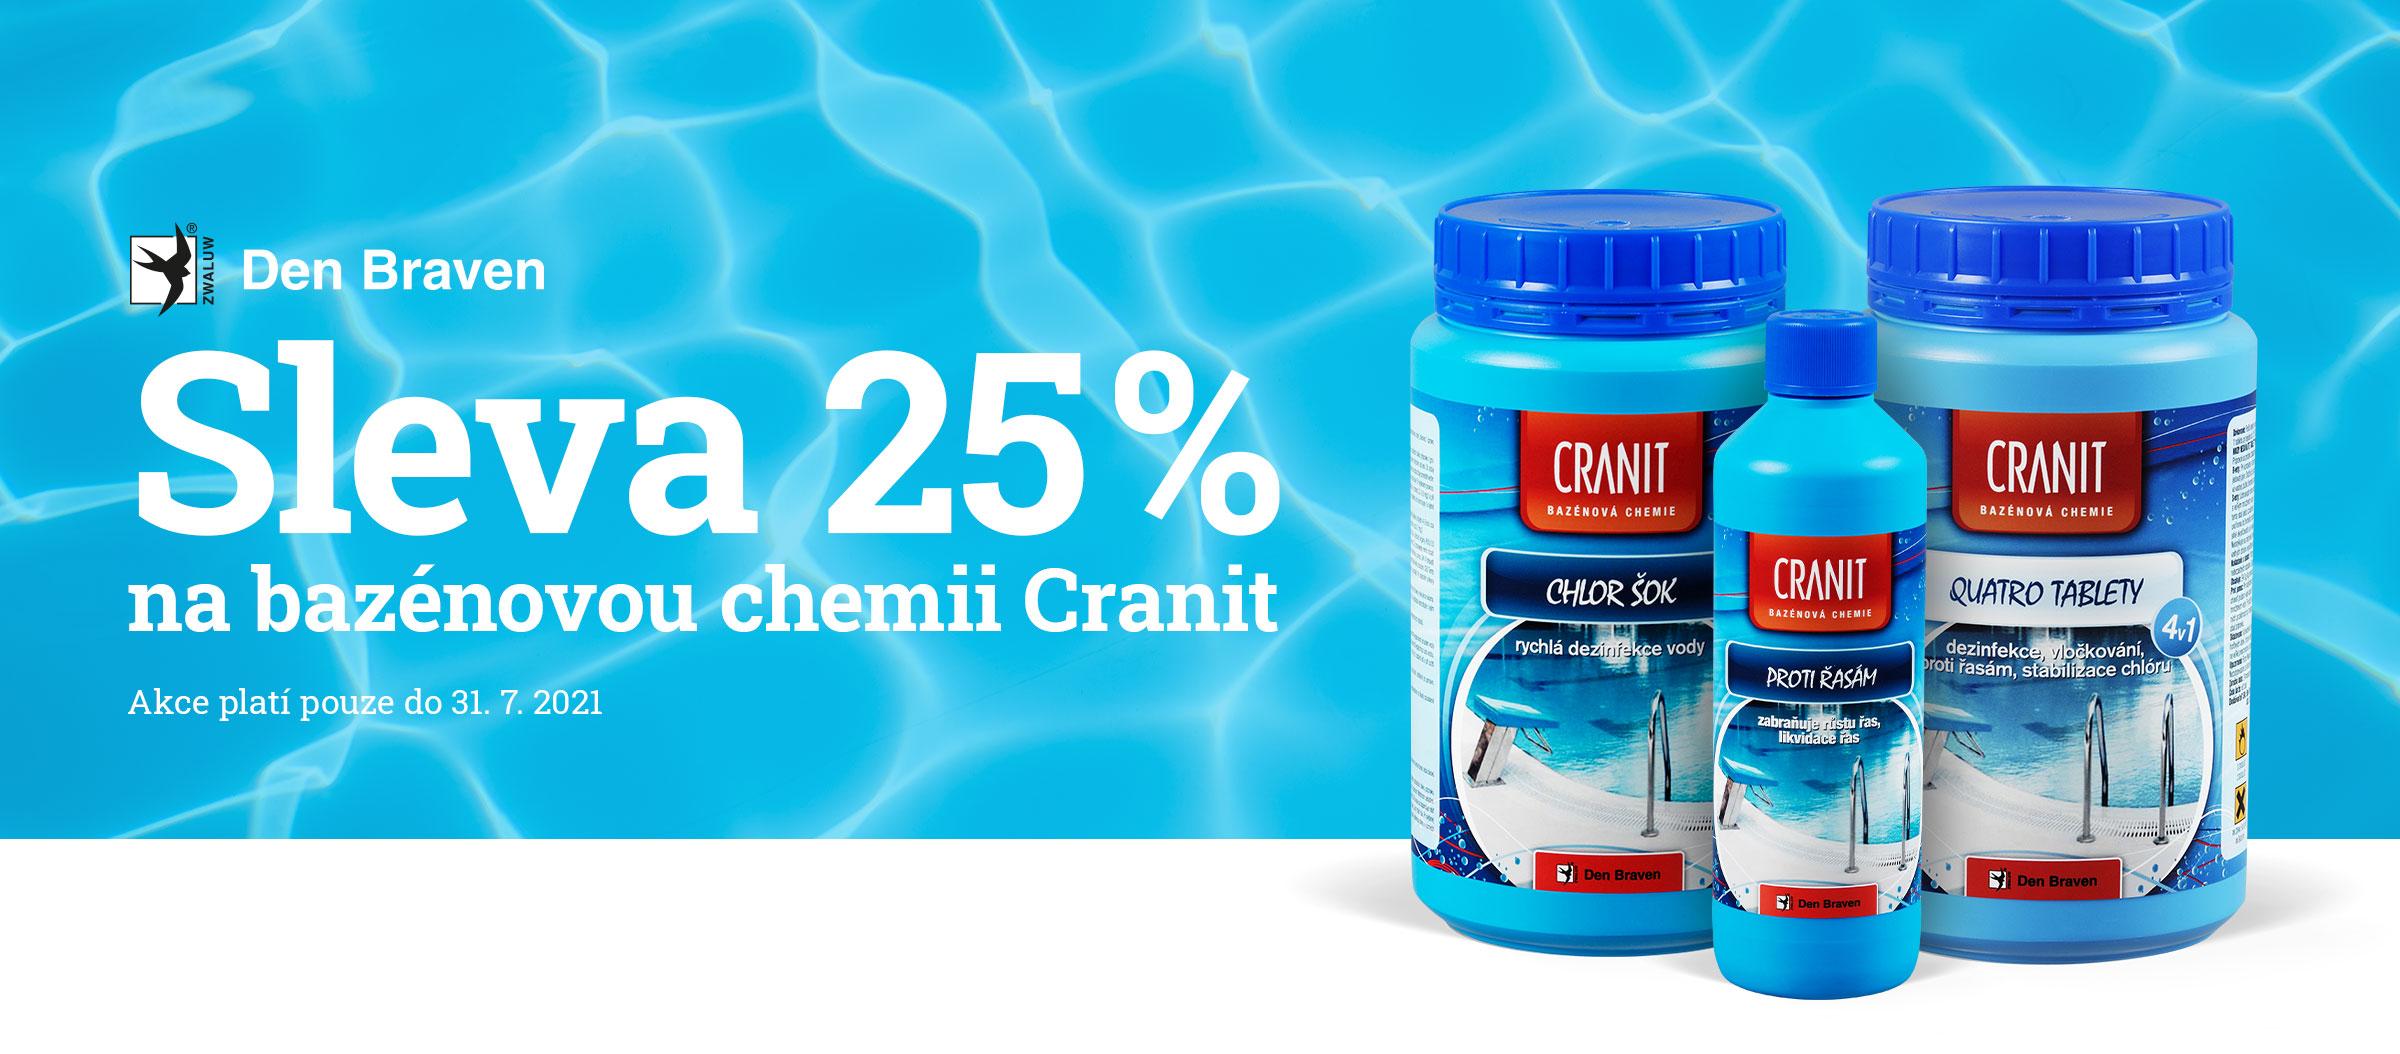 Sleva 25 % na bazénovou chemii – stavebniny Stamont